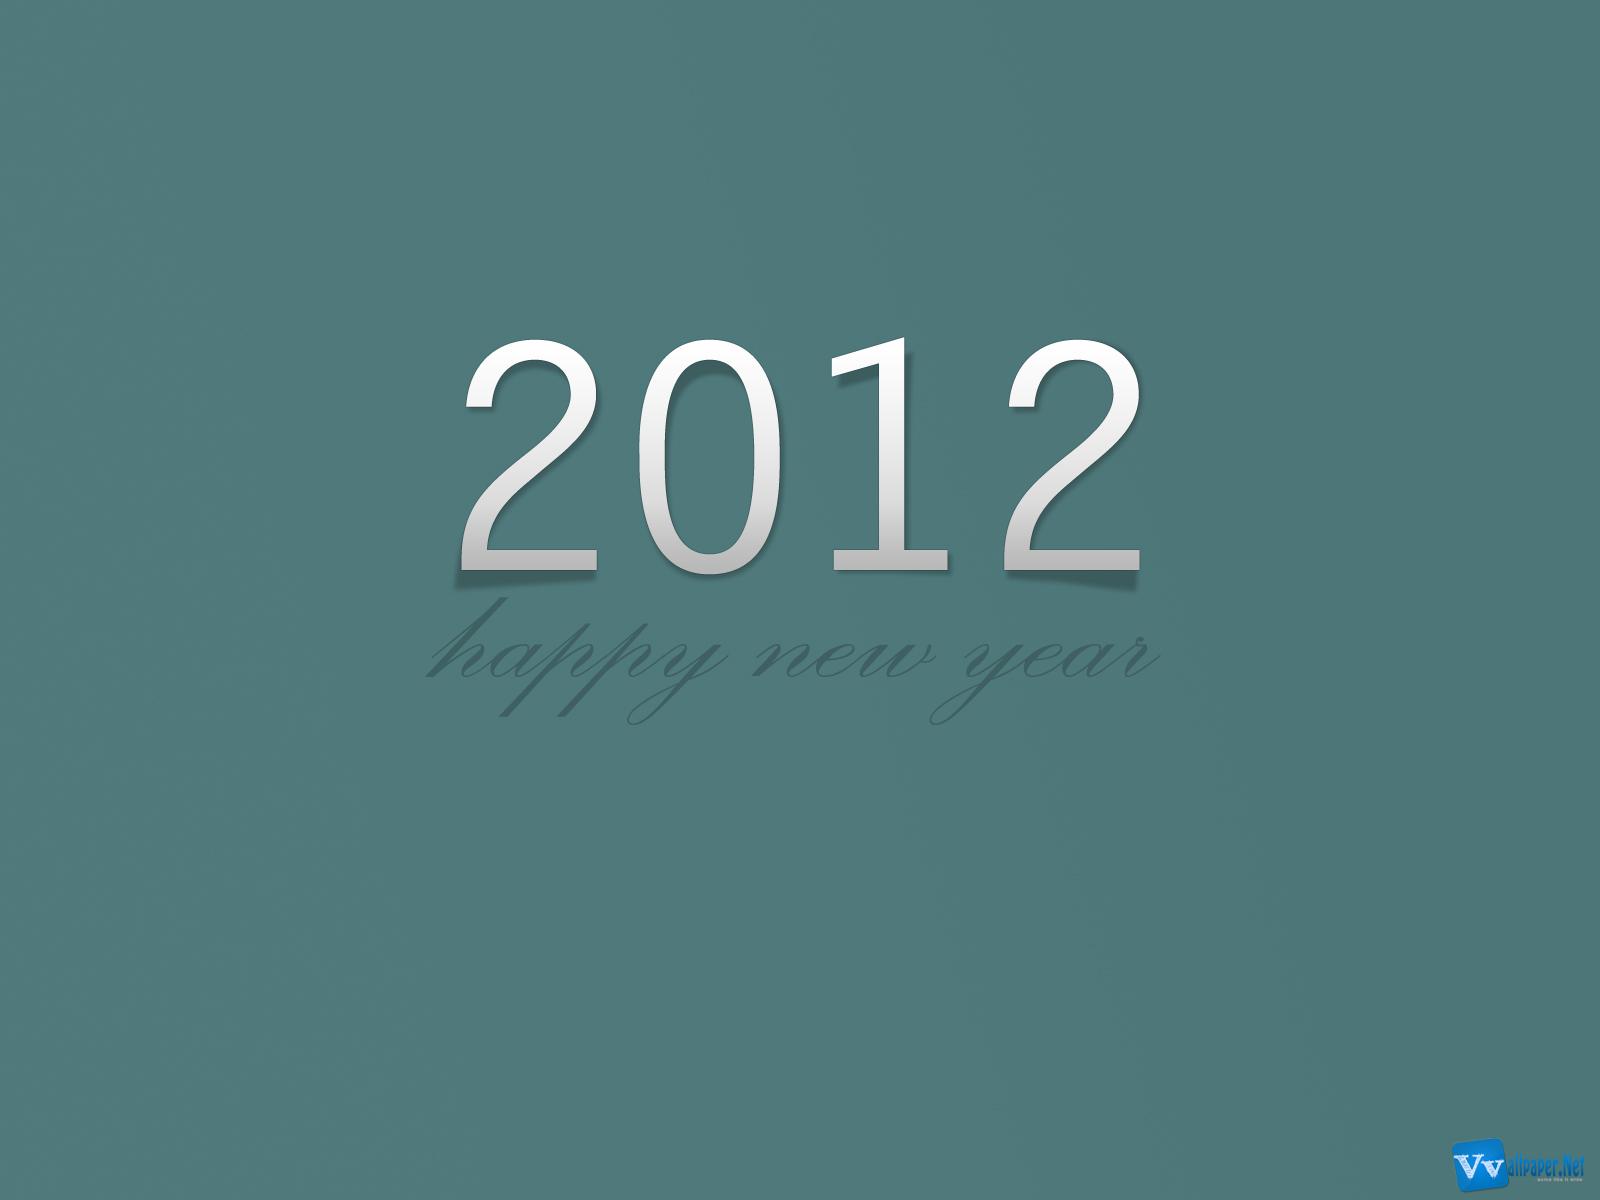 http://1.bp.blogspot.com/-FV4qXpC_PMY/TuSUeHc7g9I/AAAAAAAAE3E/YnxBuQlLHLA/s1600/Simple_Happy_New_Year_2012_Text_Wallpaper-Vvallpaper.Net.jpg